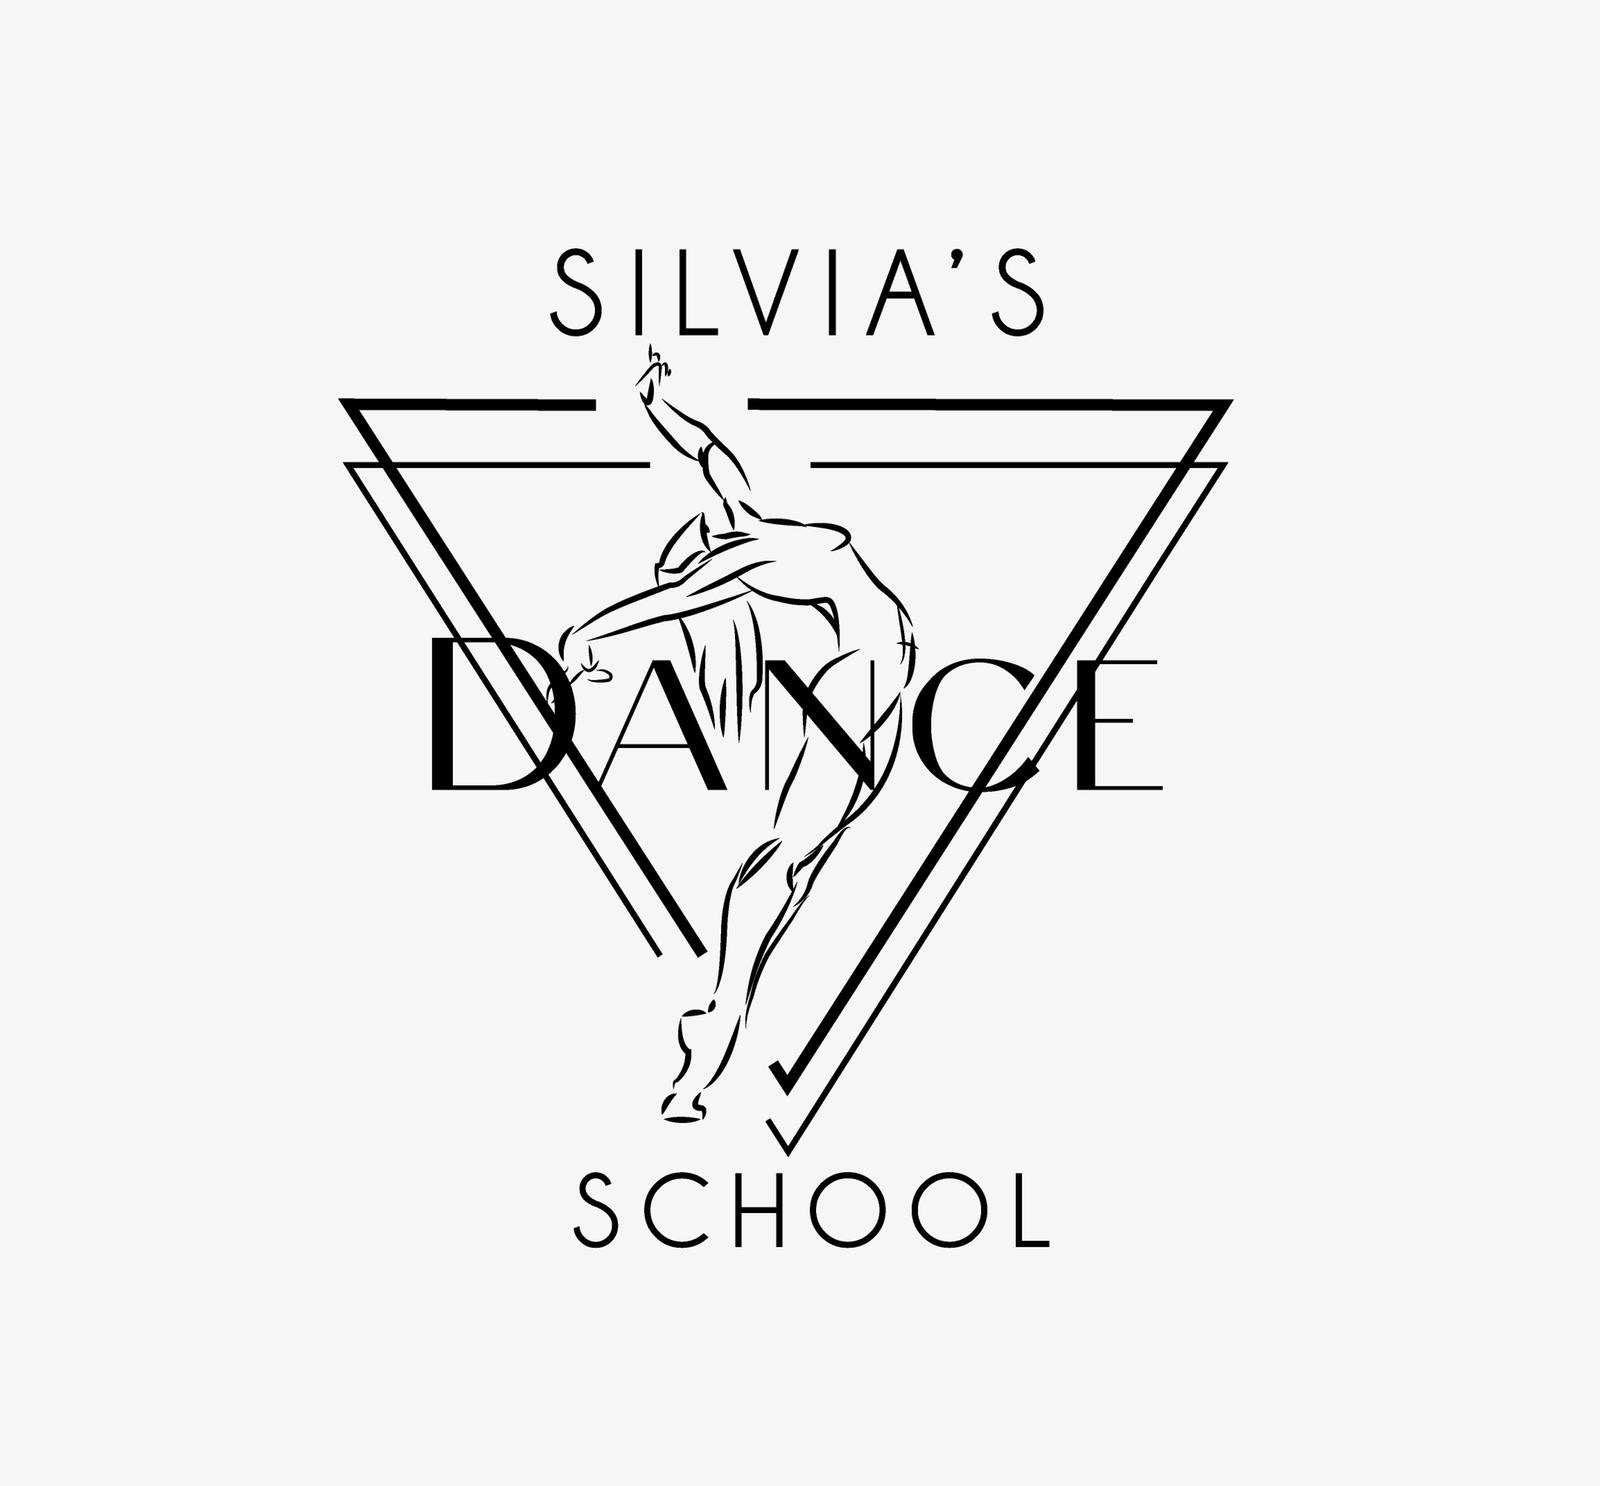 Silvia's Dance School